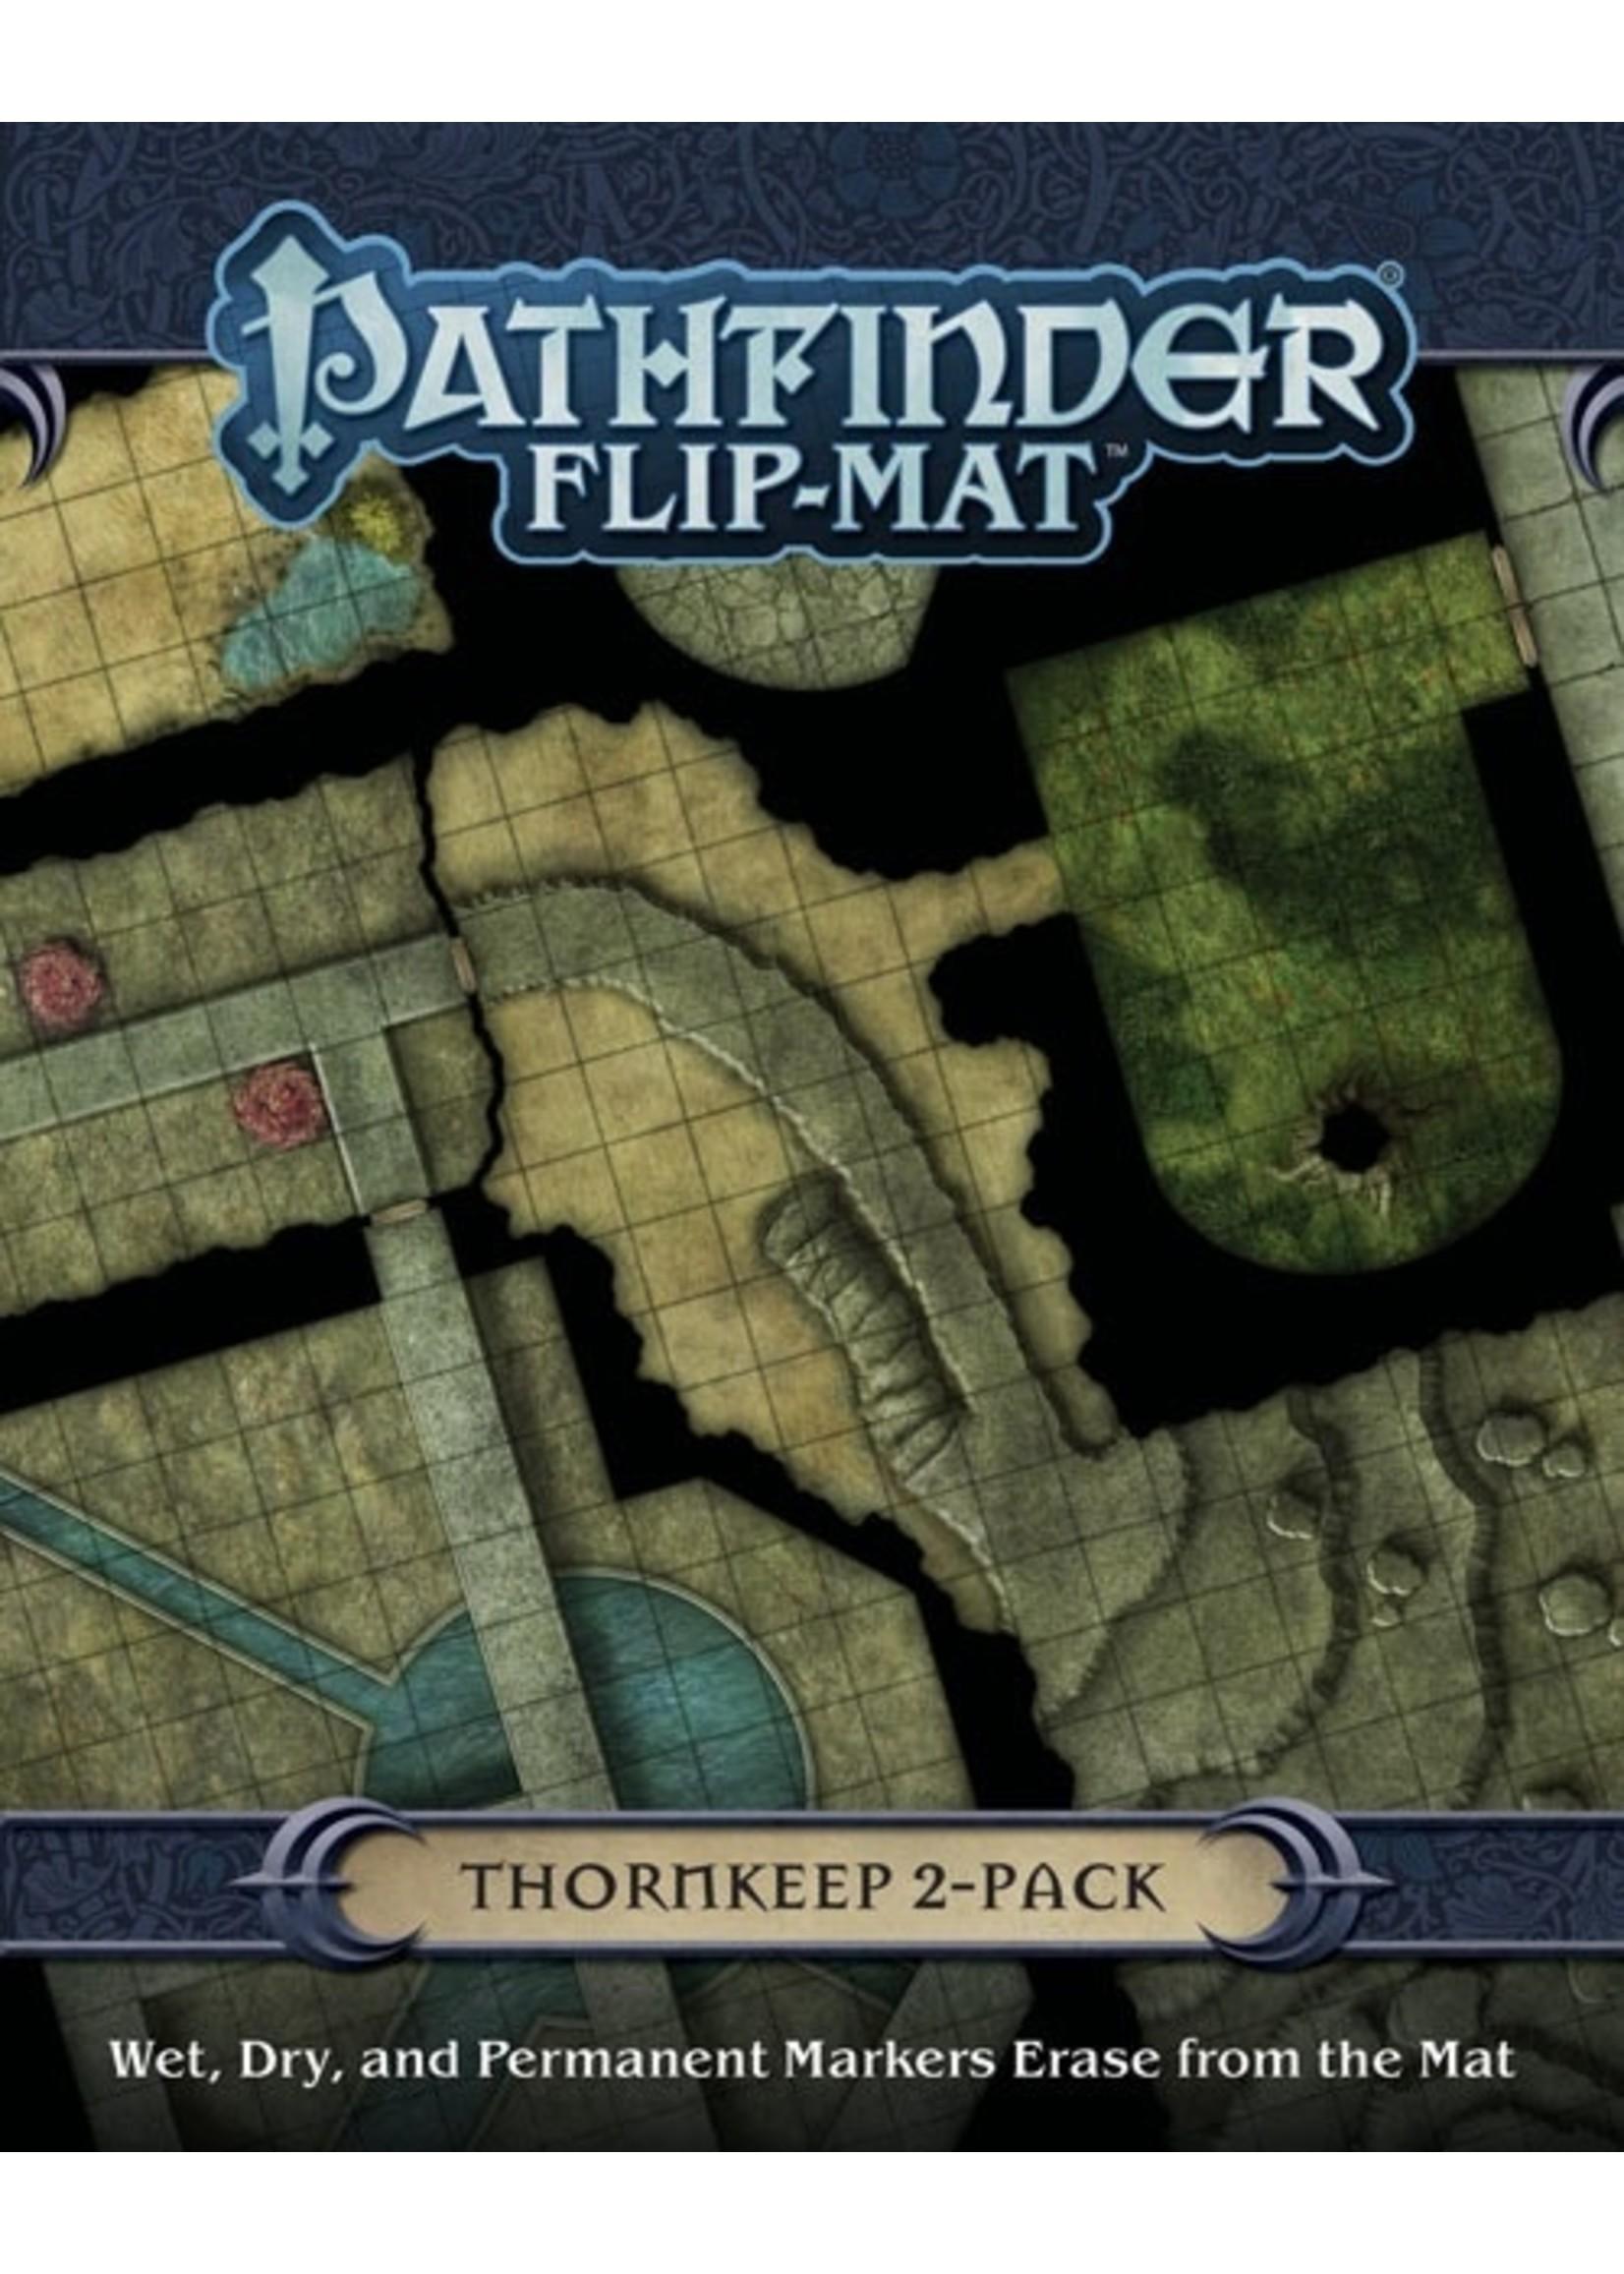 Pathfinder RPG: Flip-Mat - Thornkeep Dungeons 2 Pack